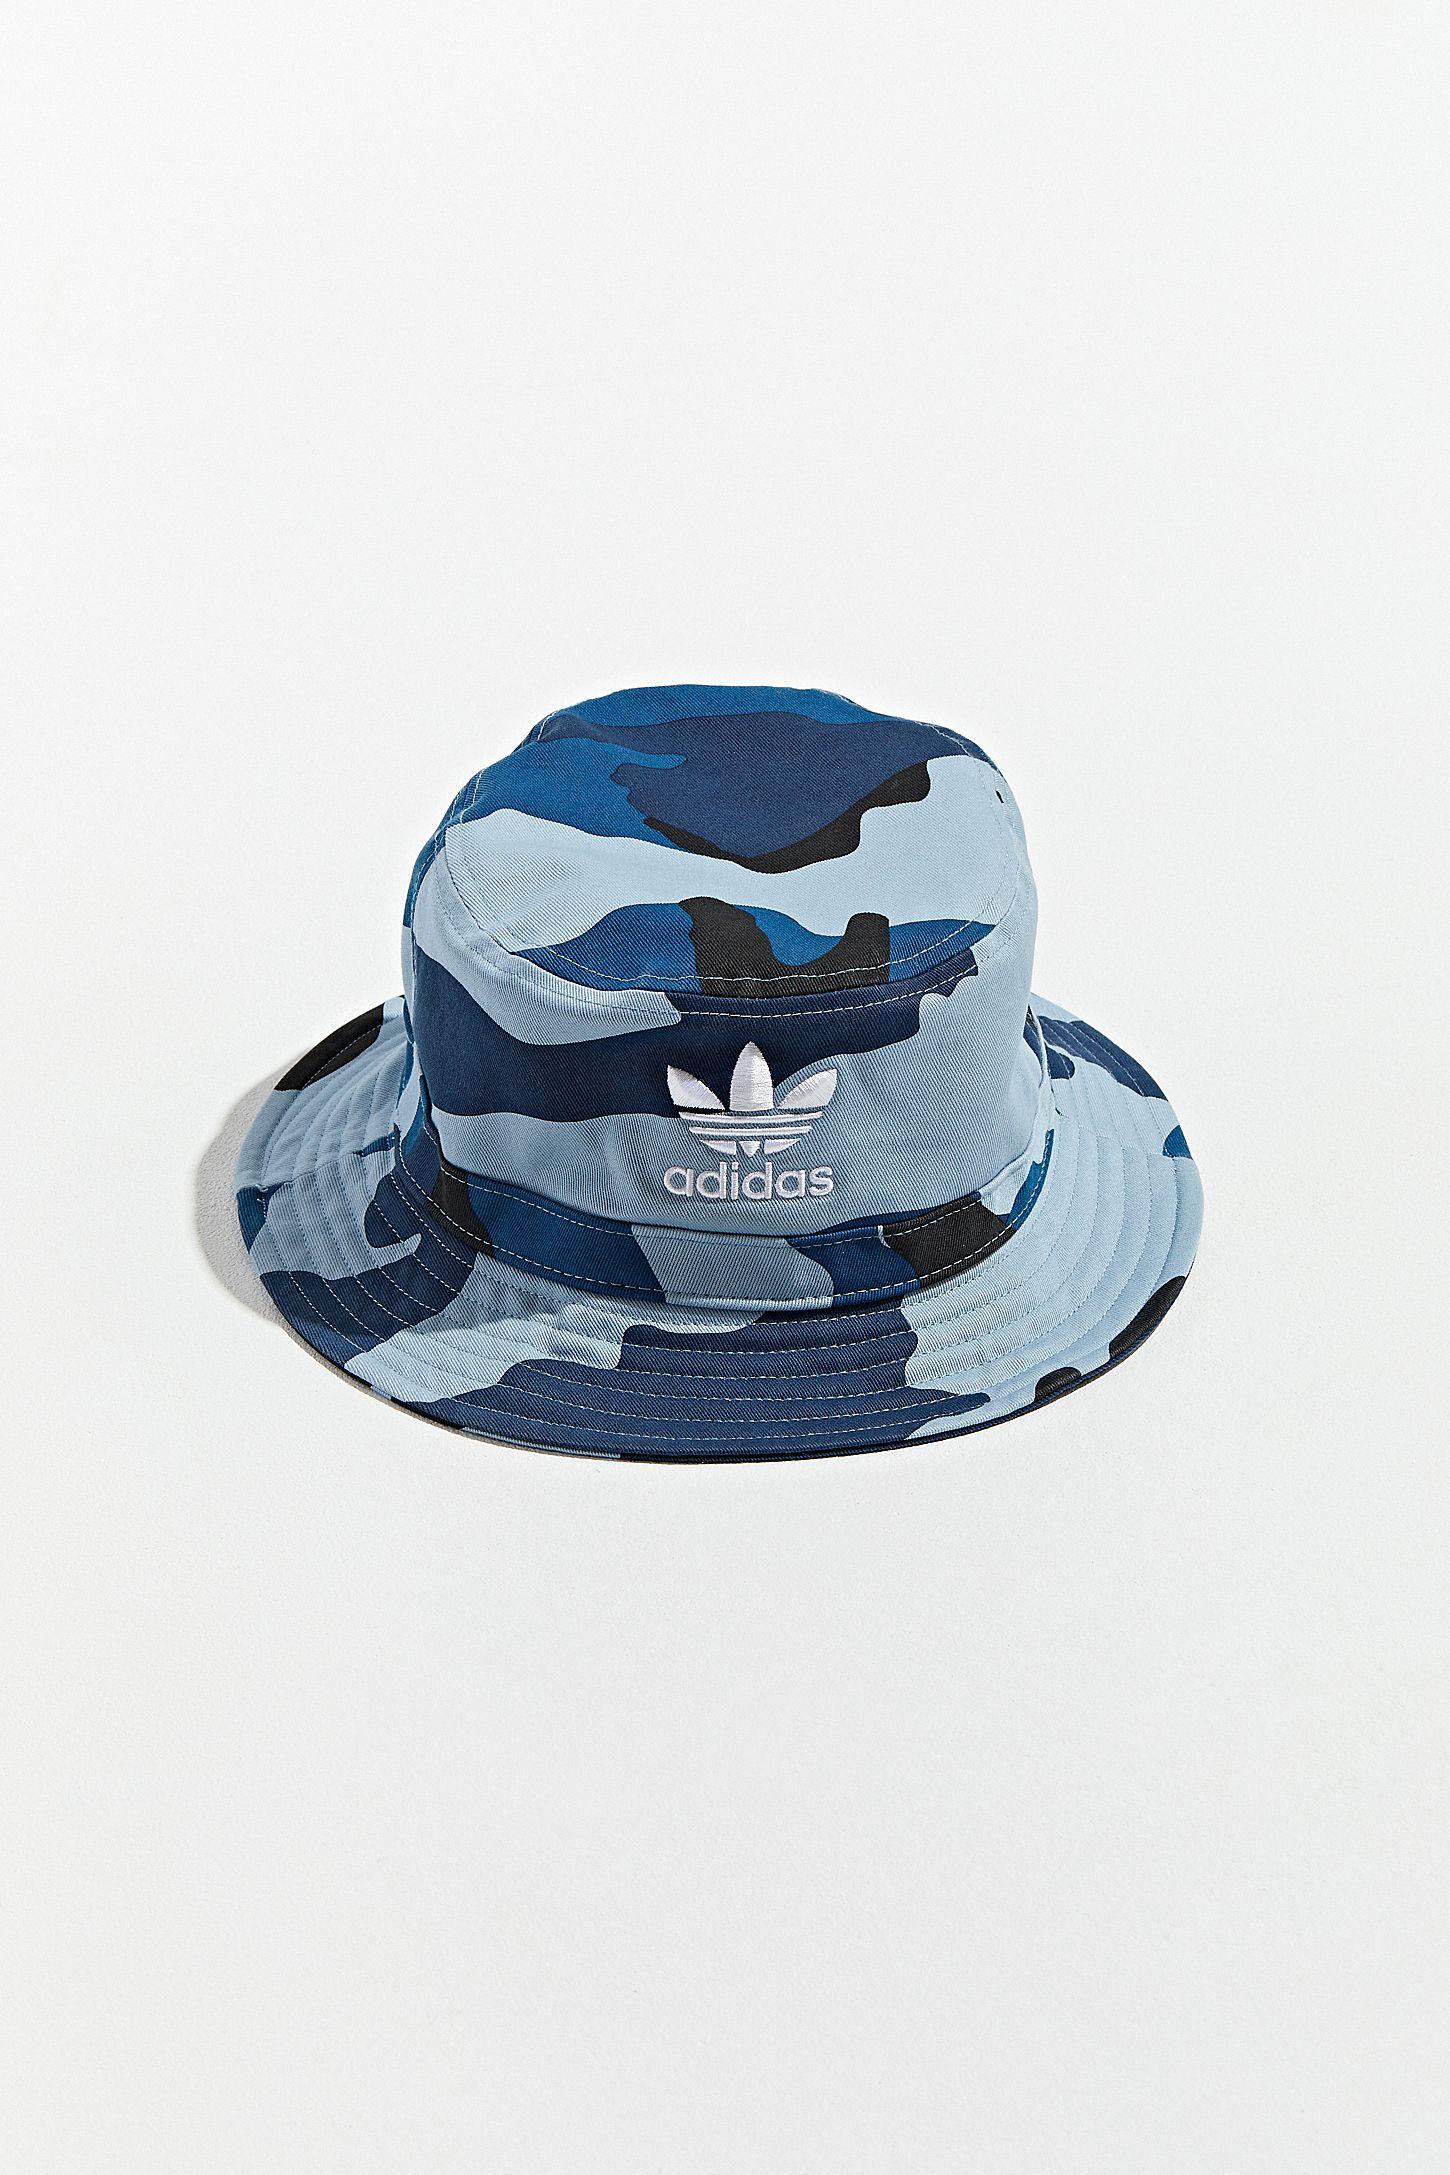 d6dbddfd adidas Originals Camo Bucket Hat | Urban Outfitters Canada